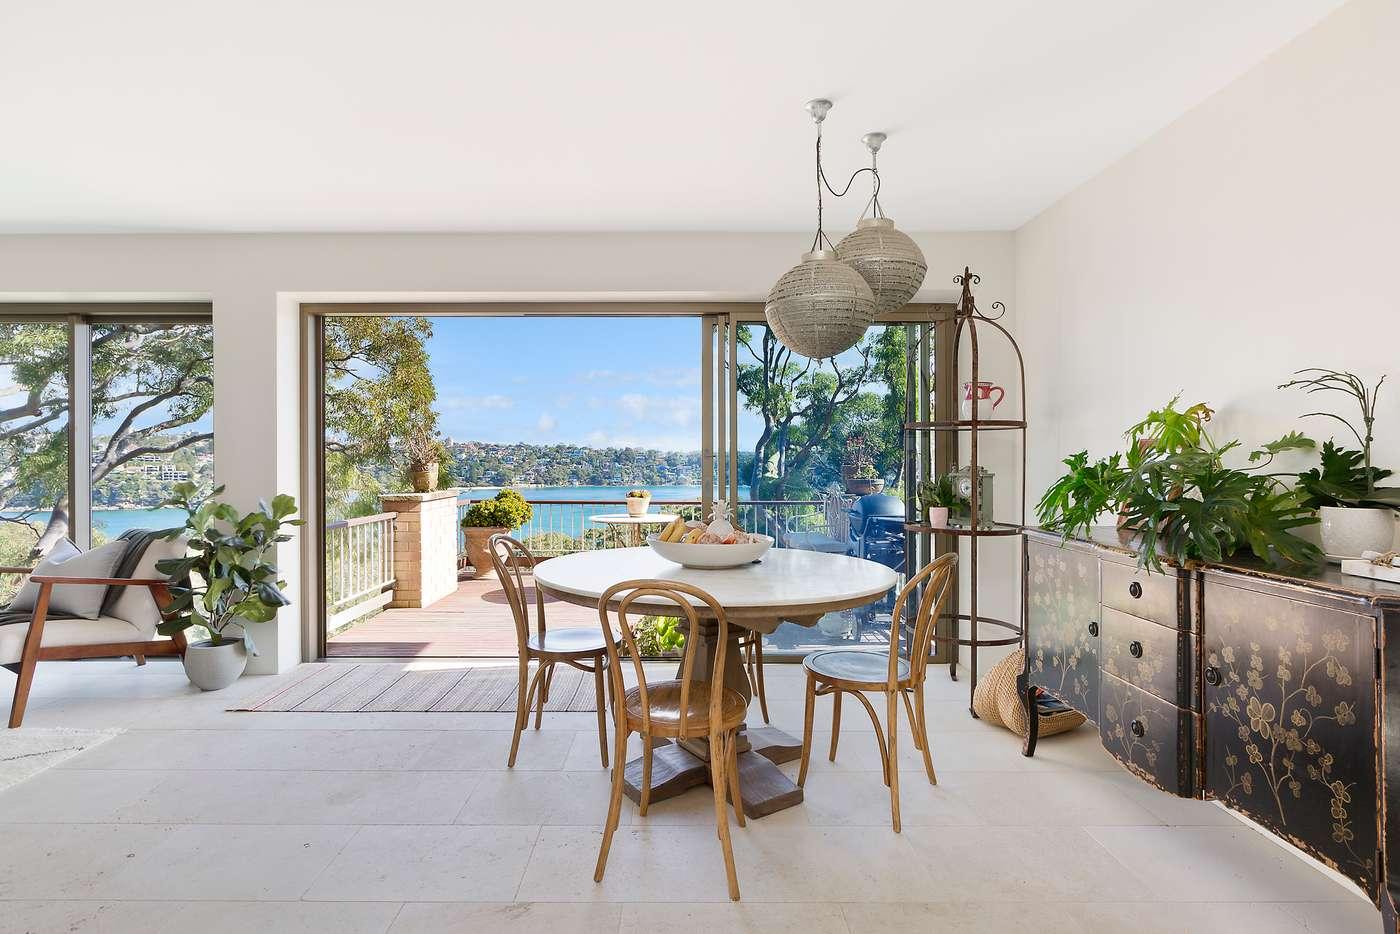 Sixth view of Homely house listing, 5 Barrabooka Street, Clontarf NSW 2093